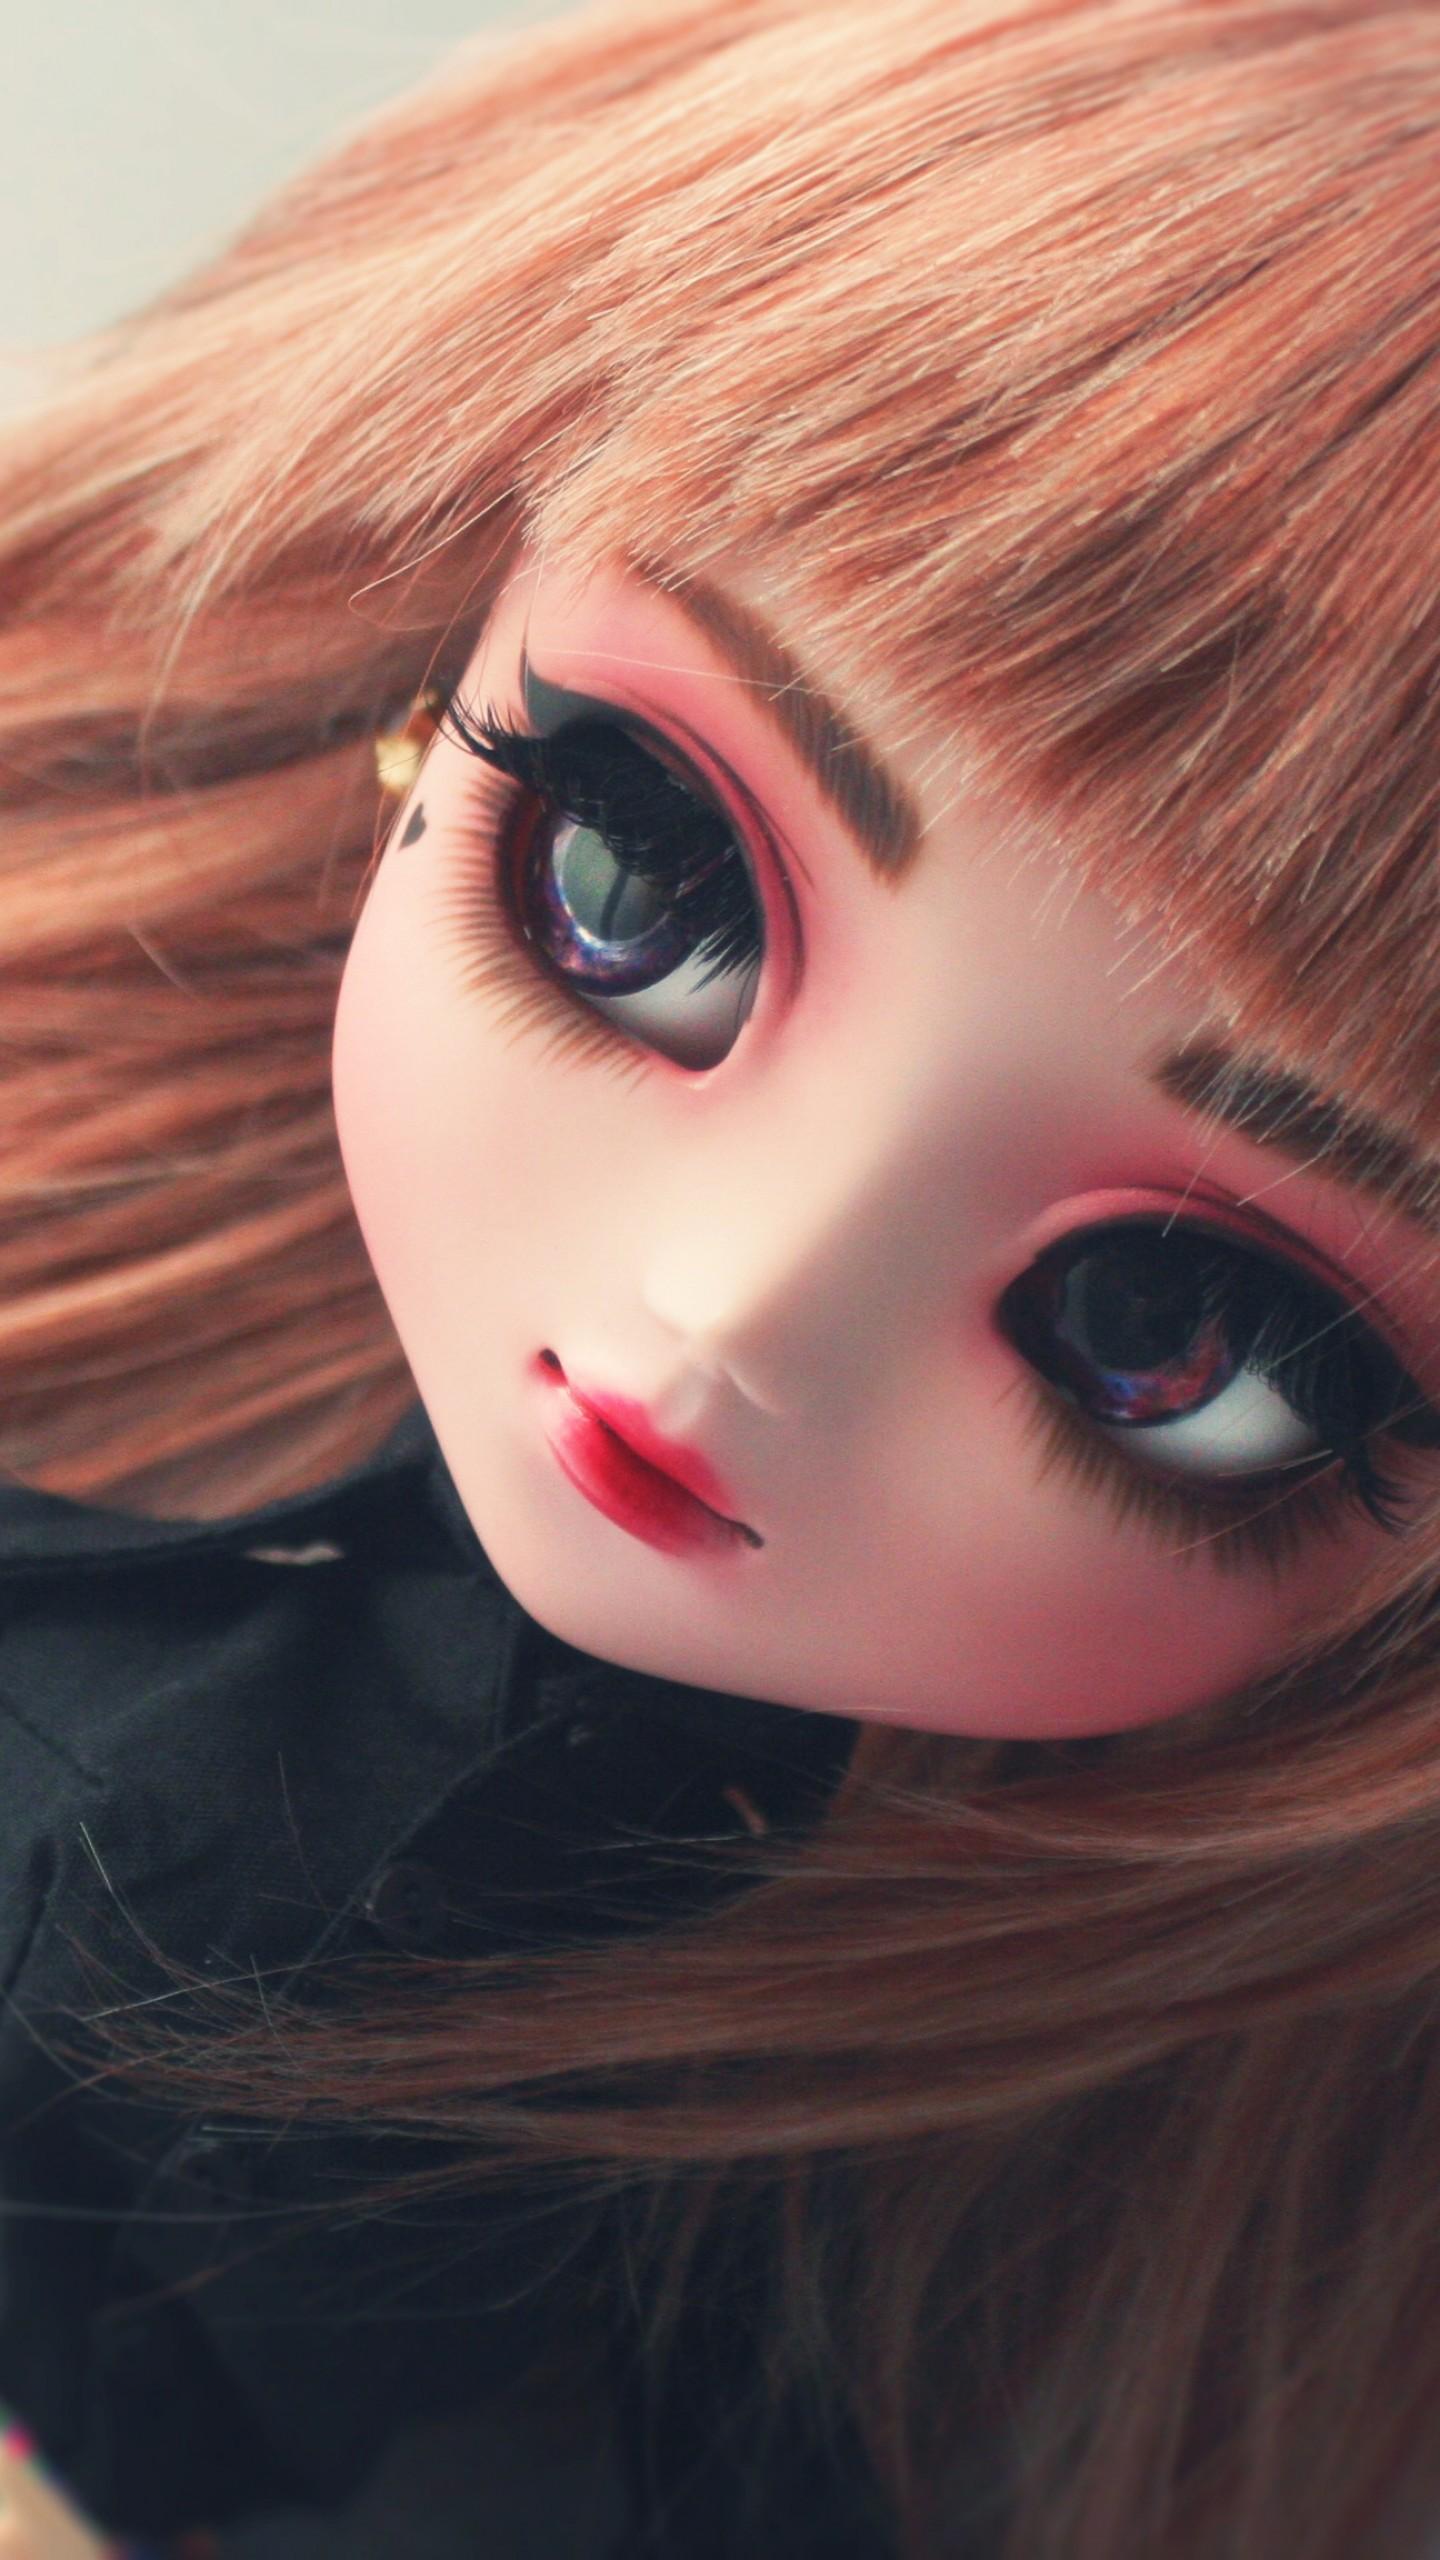 عکس زمینه عروسک ناز دختر بلوند 4K پس زمینه